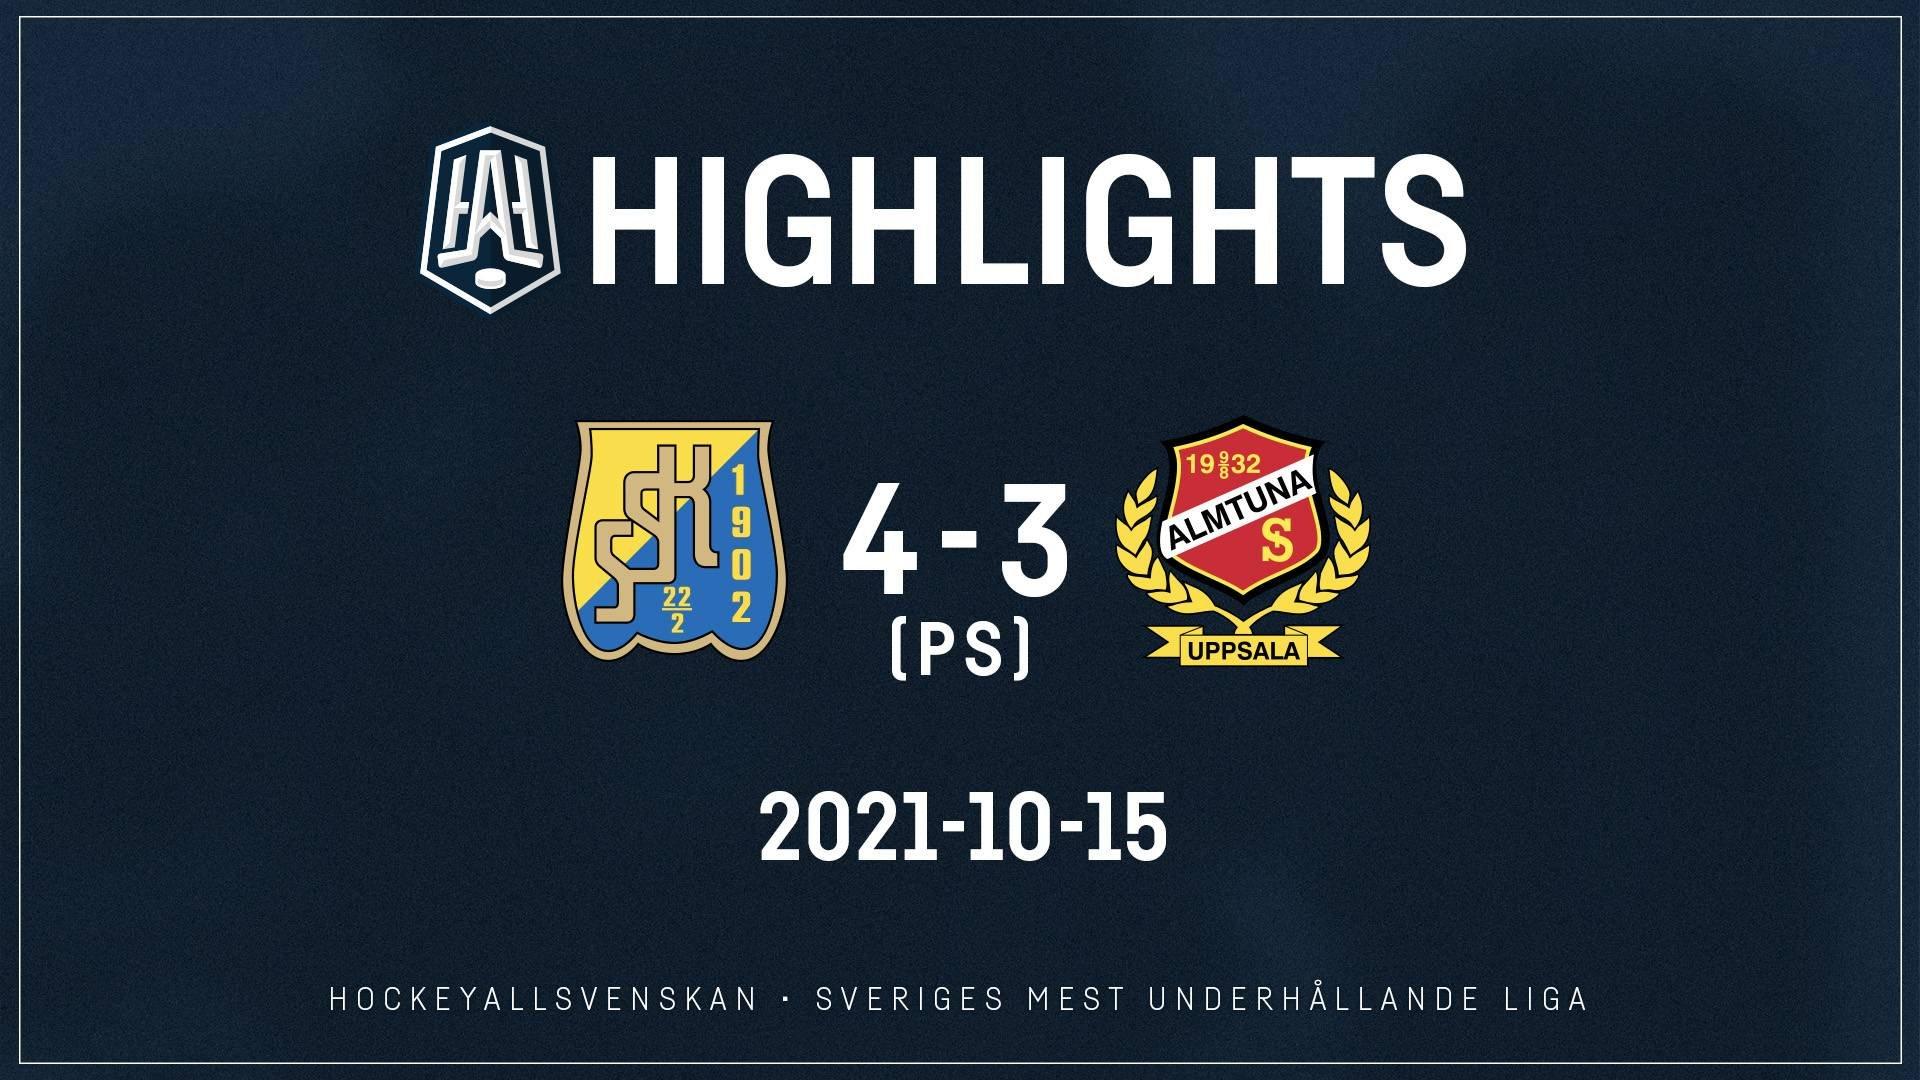 2021-10-15 Södertälje - Almtuna 4-3 (OT)